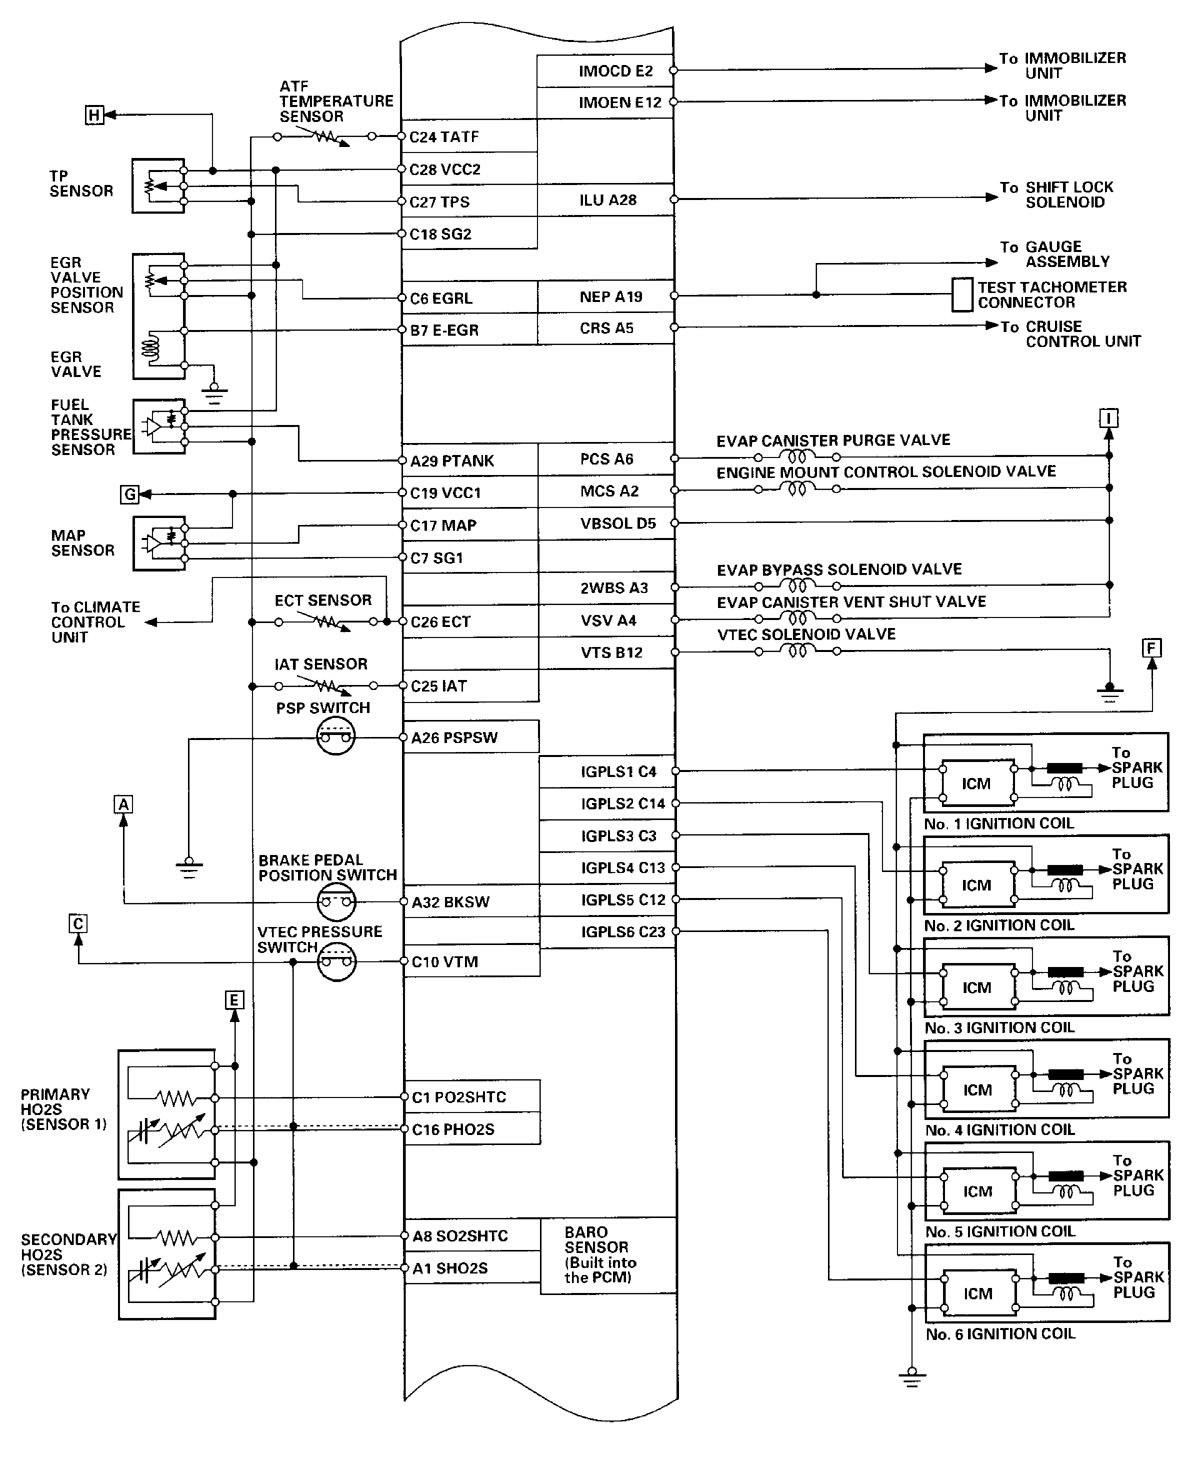 2000 Acura Tl Wiring Diagram Trusted Integra Wire 2001 Diagrams Fuel Controls Carknowledge Alarm